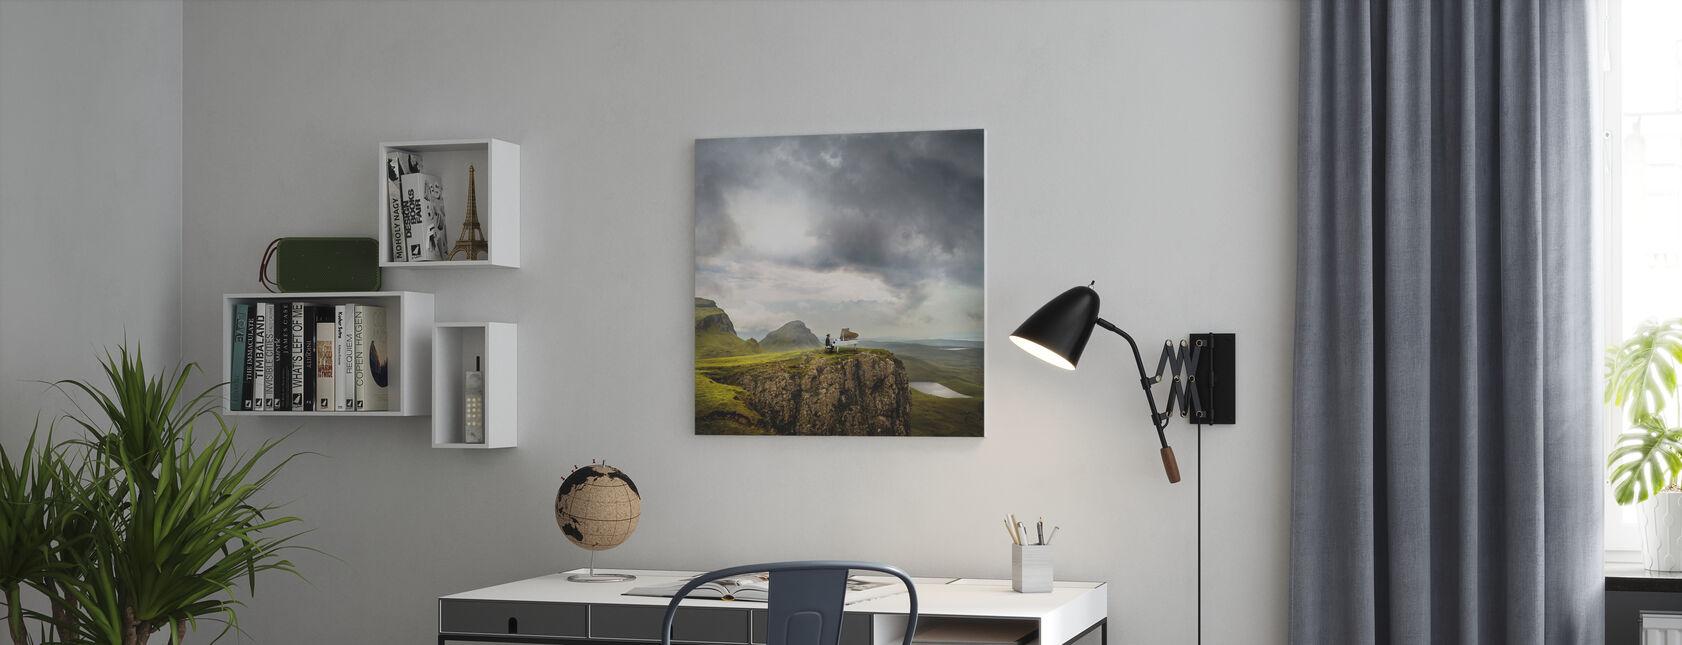 Last Chords - Canvas print - Office